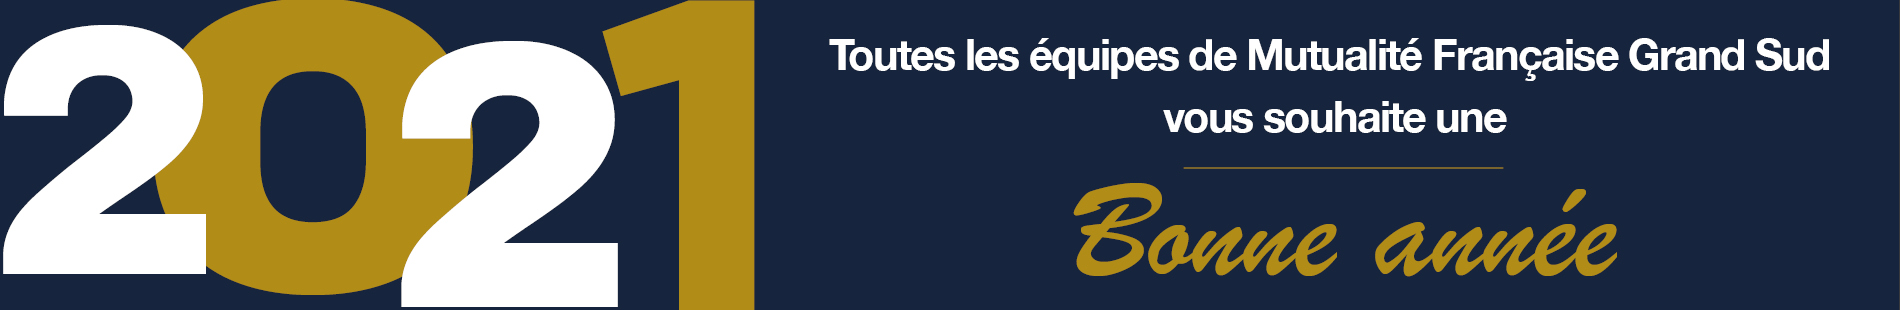 https://www.mfgs.fr/actualites/voeux-2021